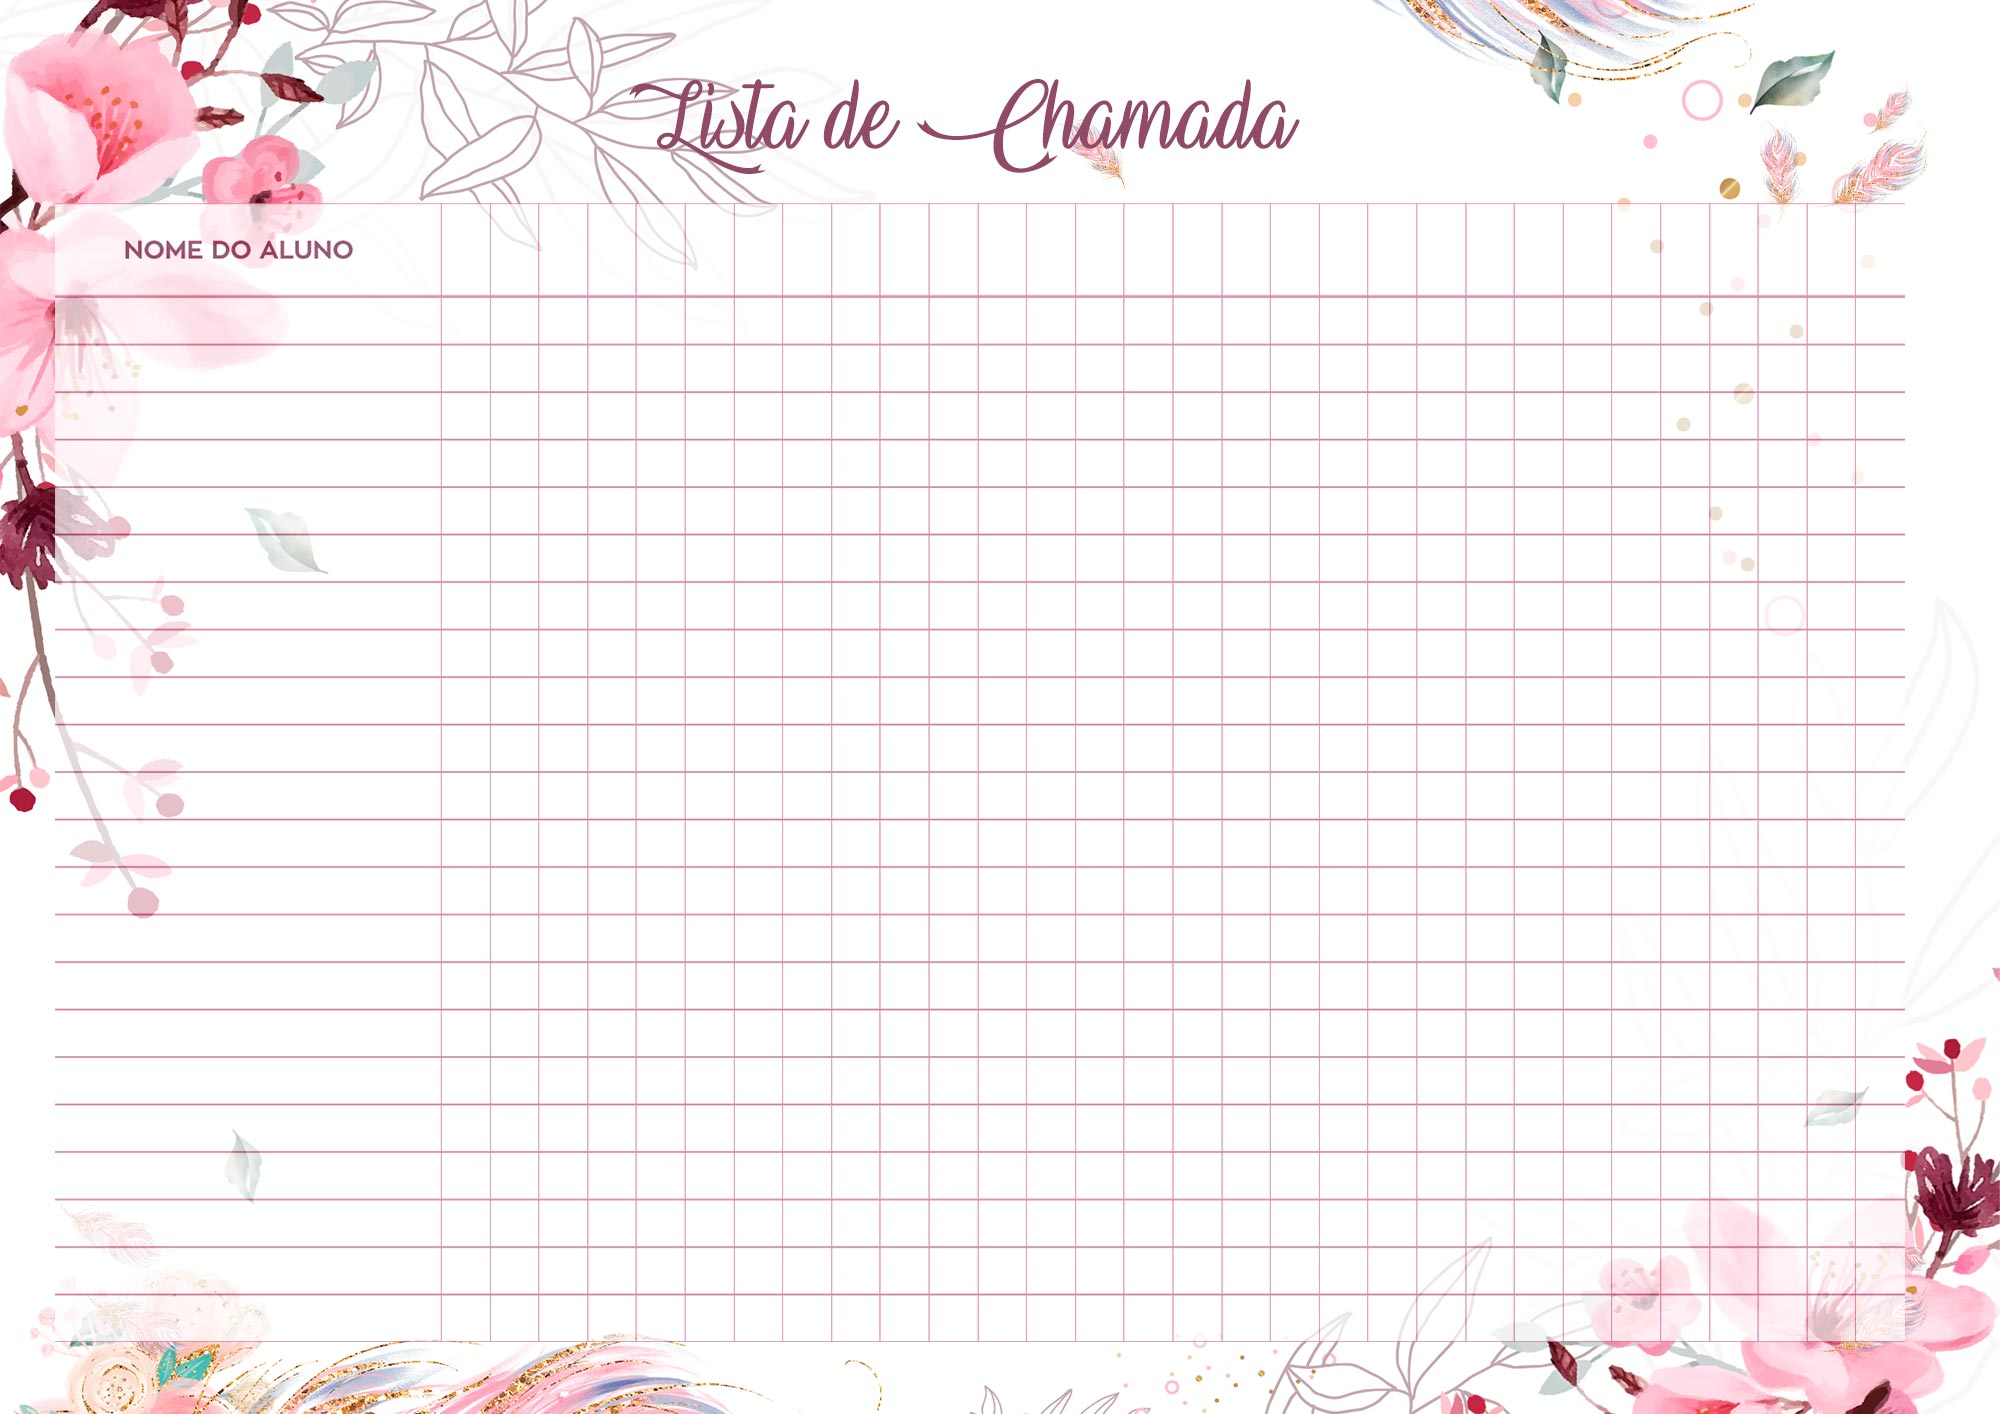 Planner para Professores Floral Lista de Chamada